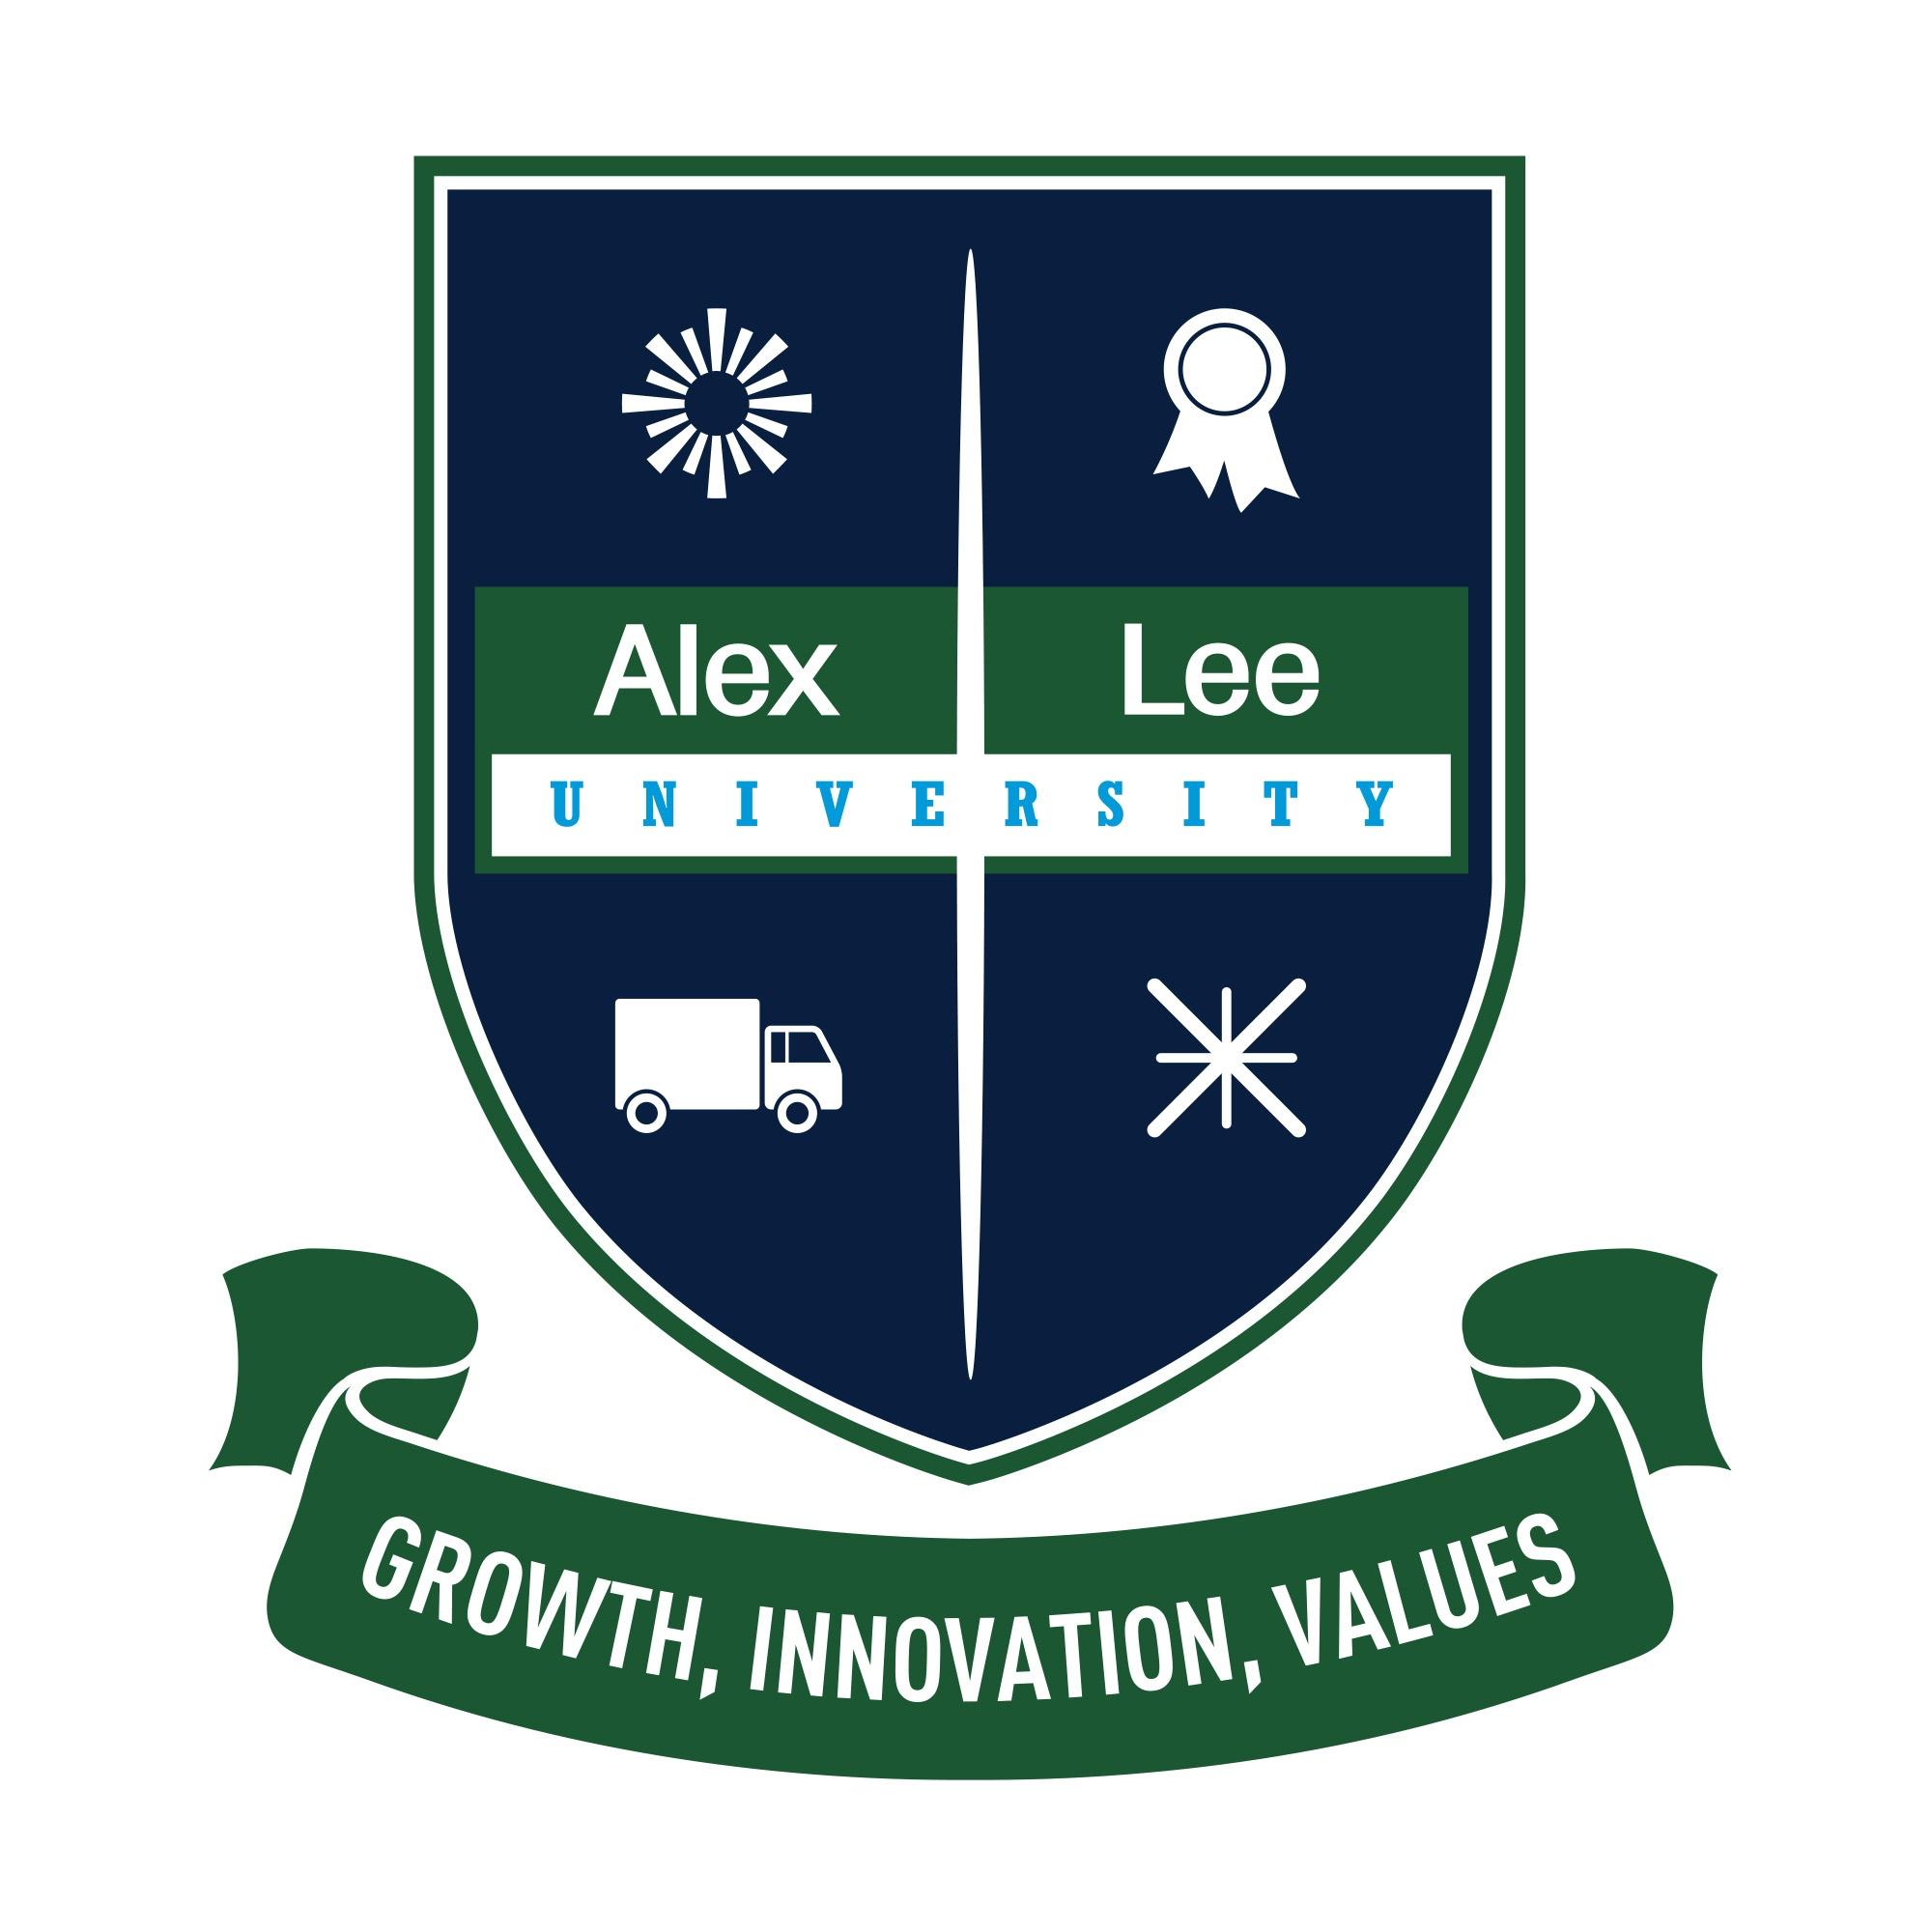 AlexLee_University_Crest.jpg